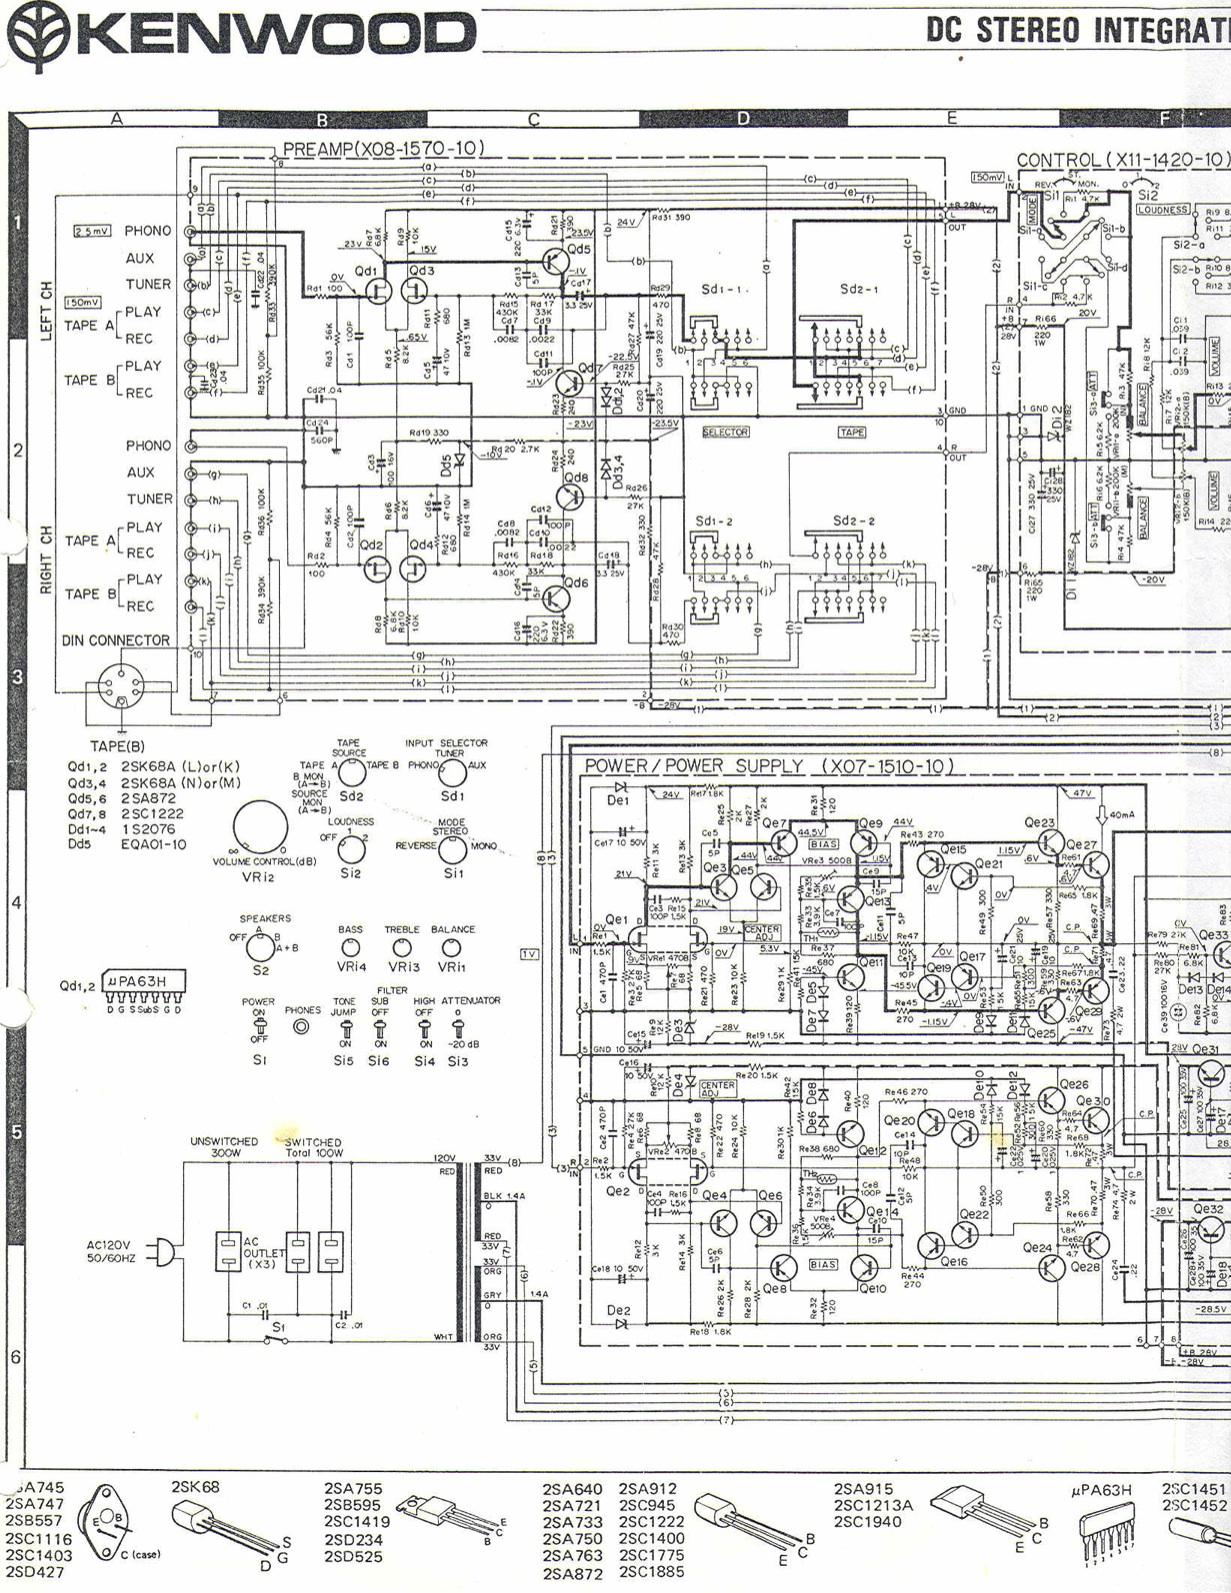 coleman evcon wiring diagram defrost board coleman york ac wiring diagram york gas furnace wiring diagram [ 1231 x 1593 Pixel ]